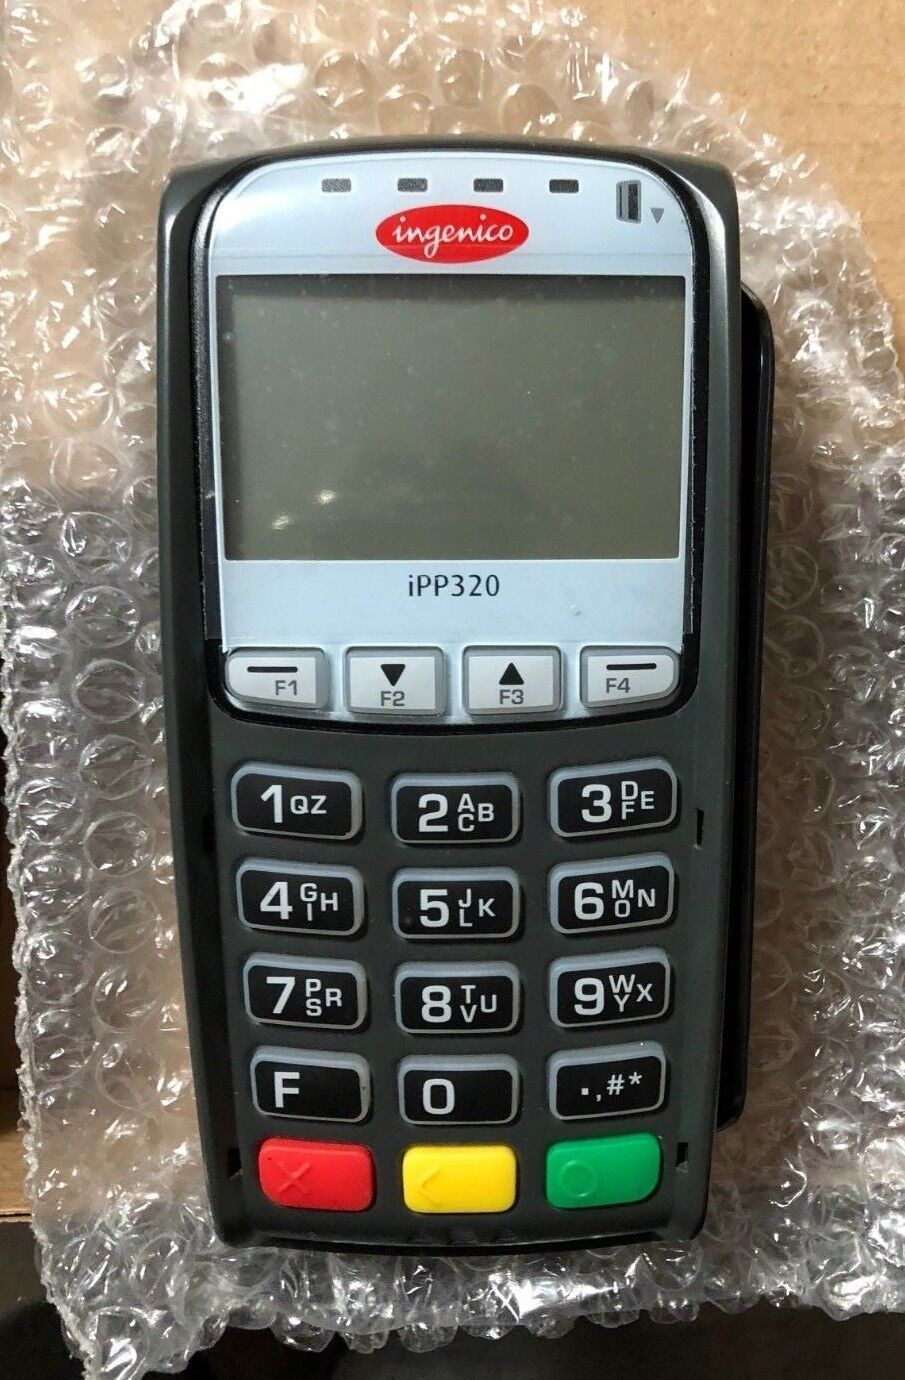 Ingenico Ipp320 EMV Pin Pad W/ Chip Reader POS